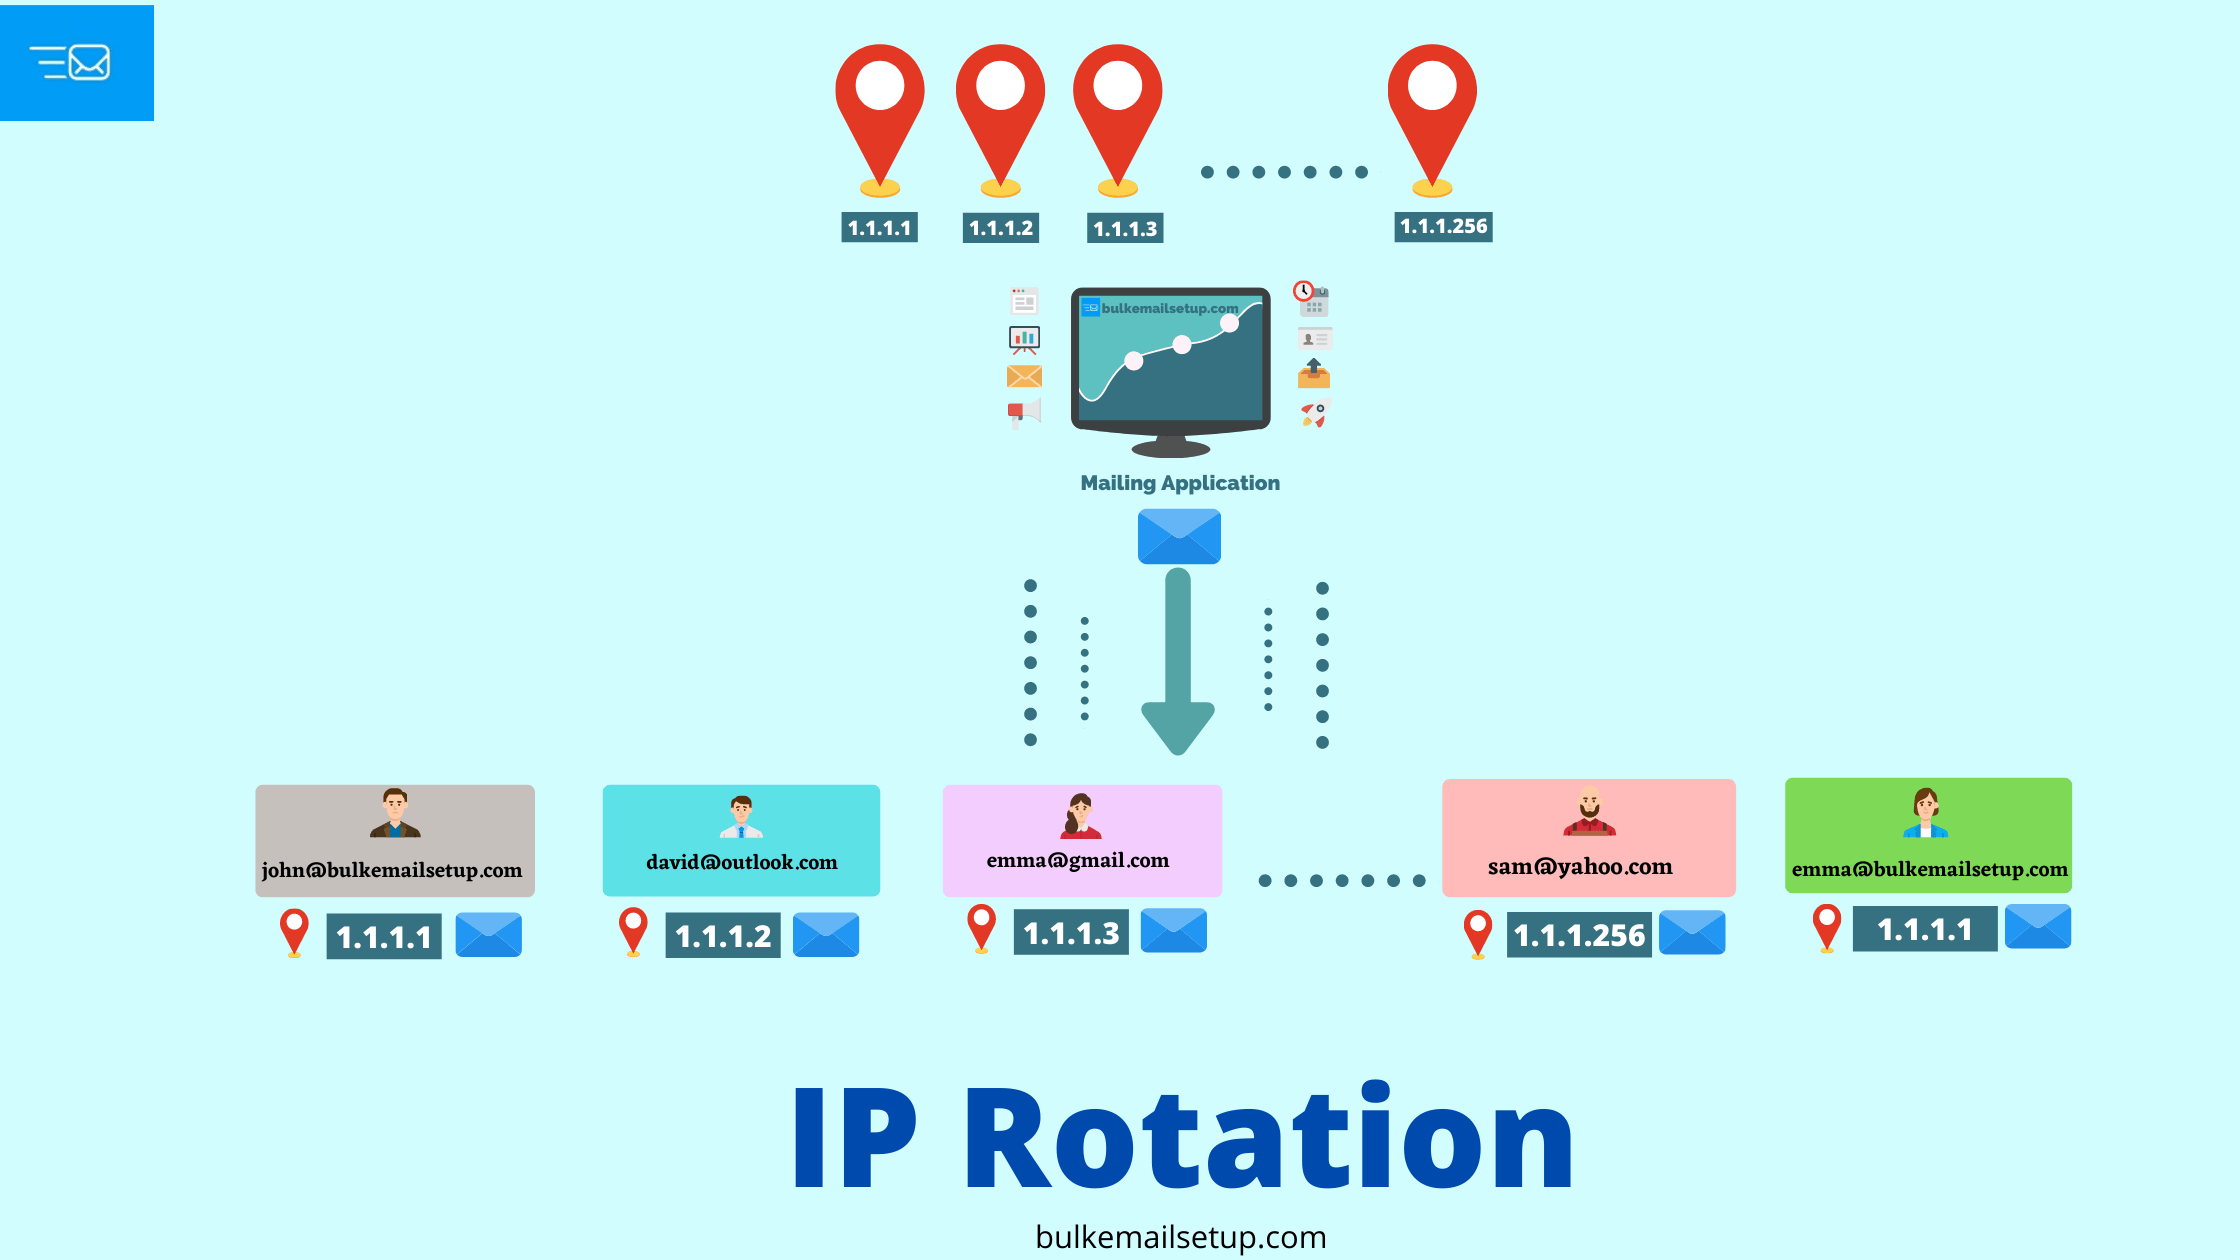 IP Rotation